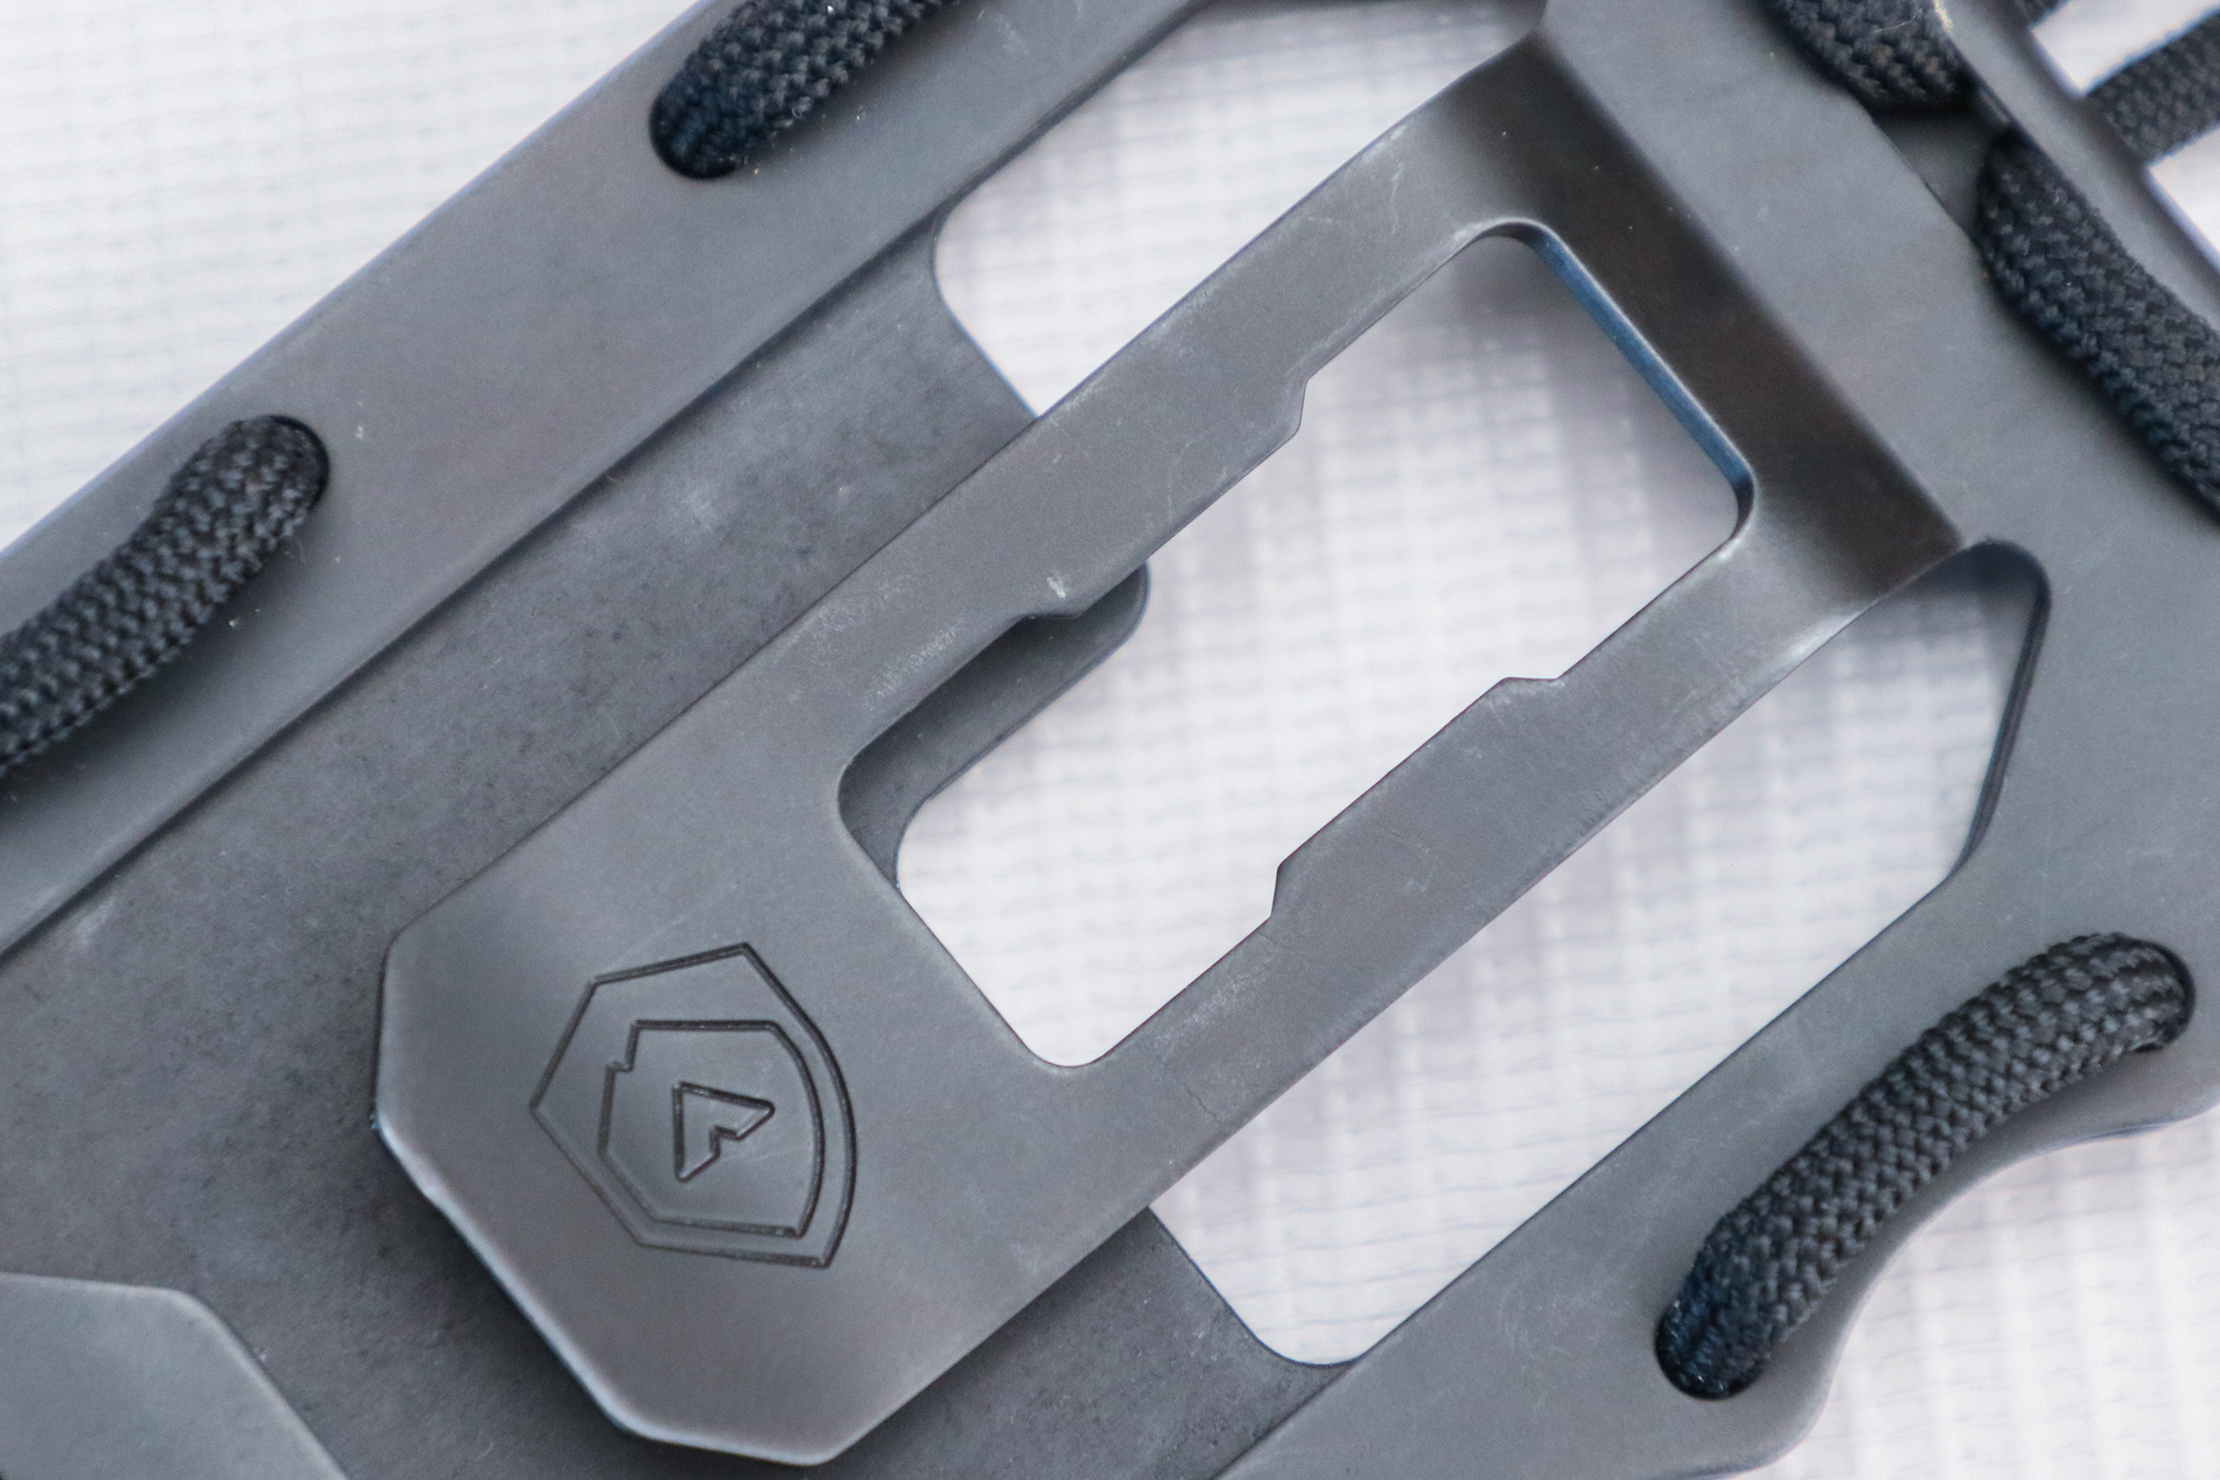 Trayvax Original 2.0 Wallet Clip